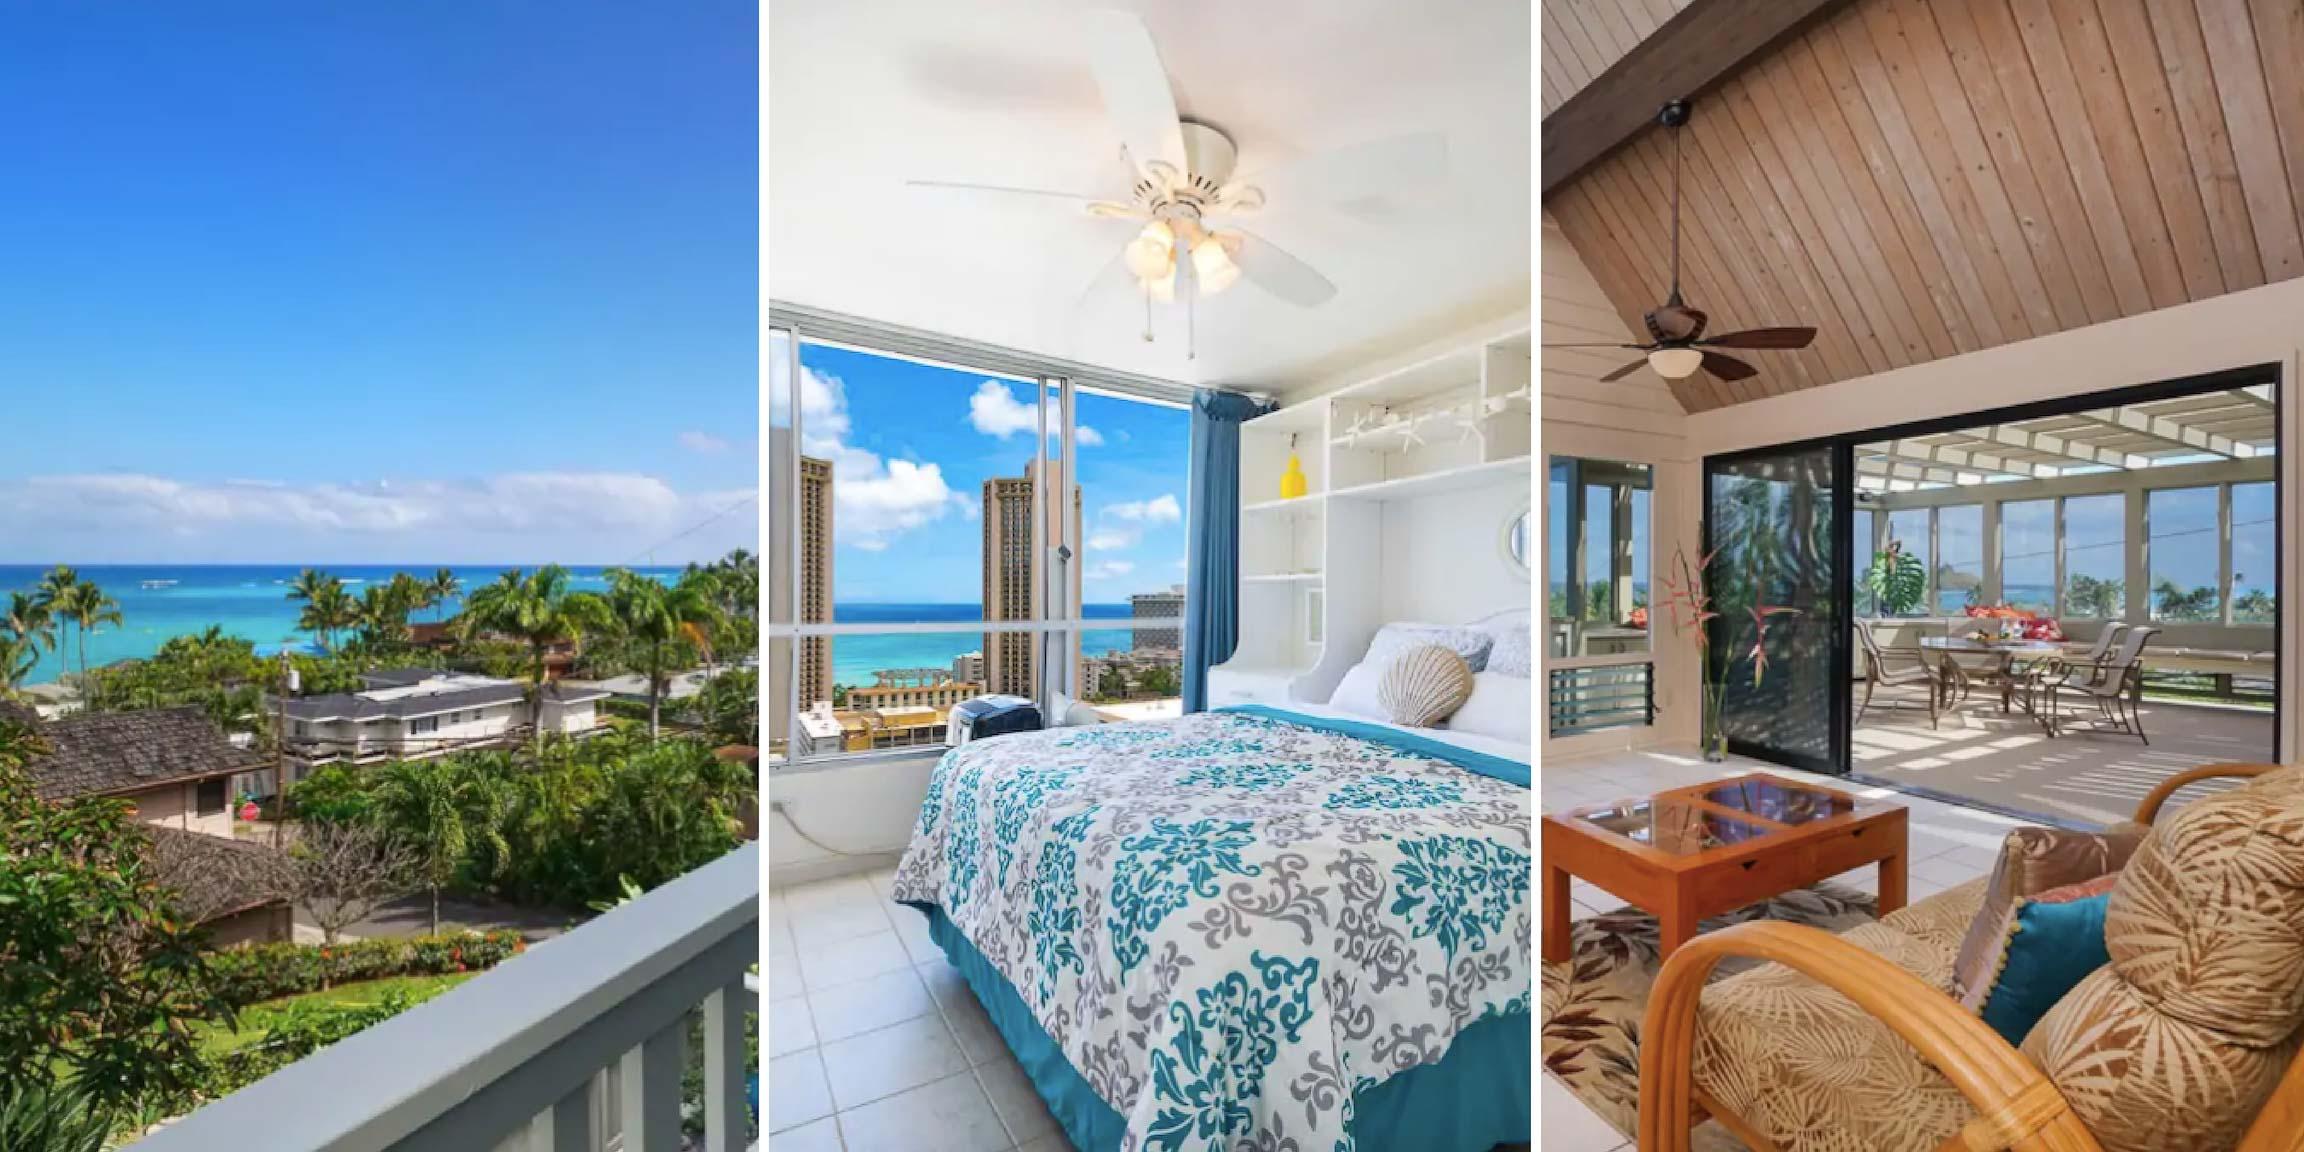 11 Best Airbnb Oahu Rentals: Waikiki, Kailua, North Shore